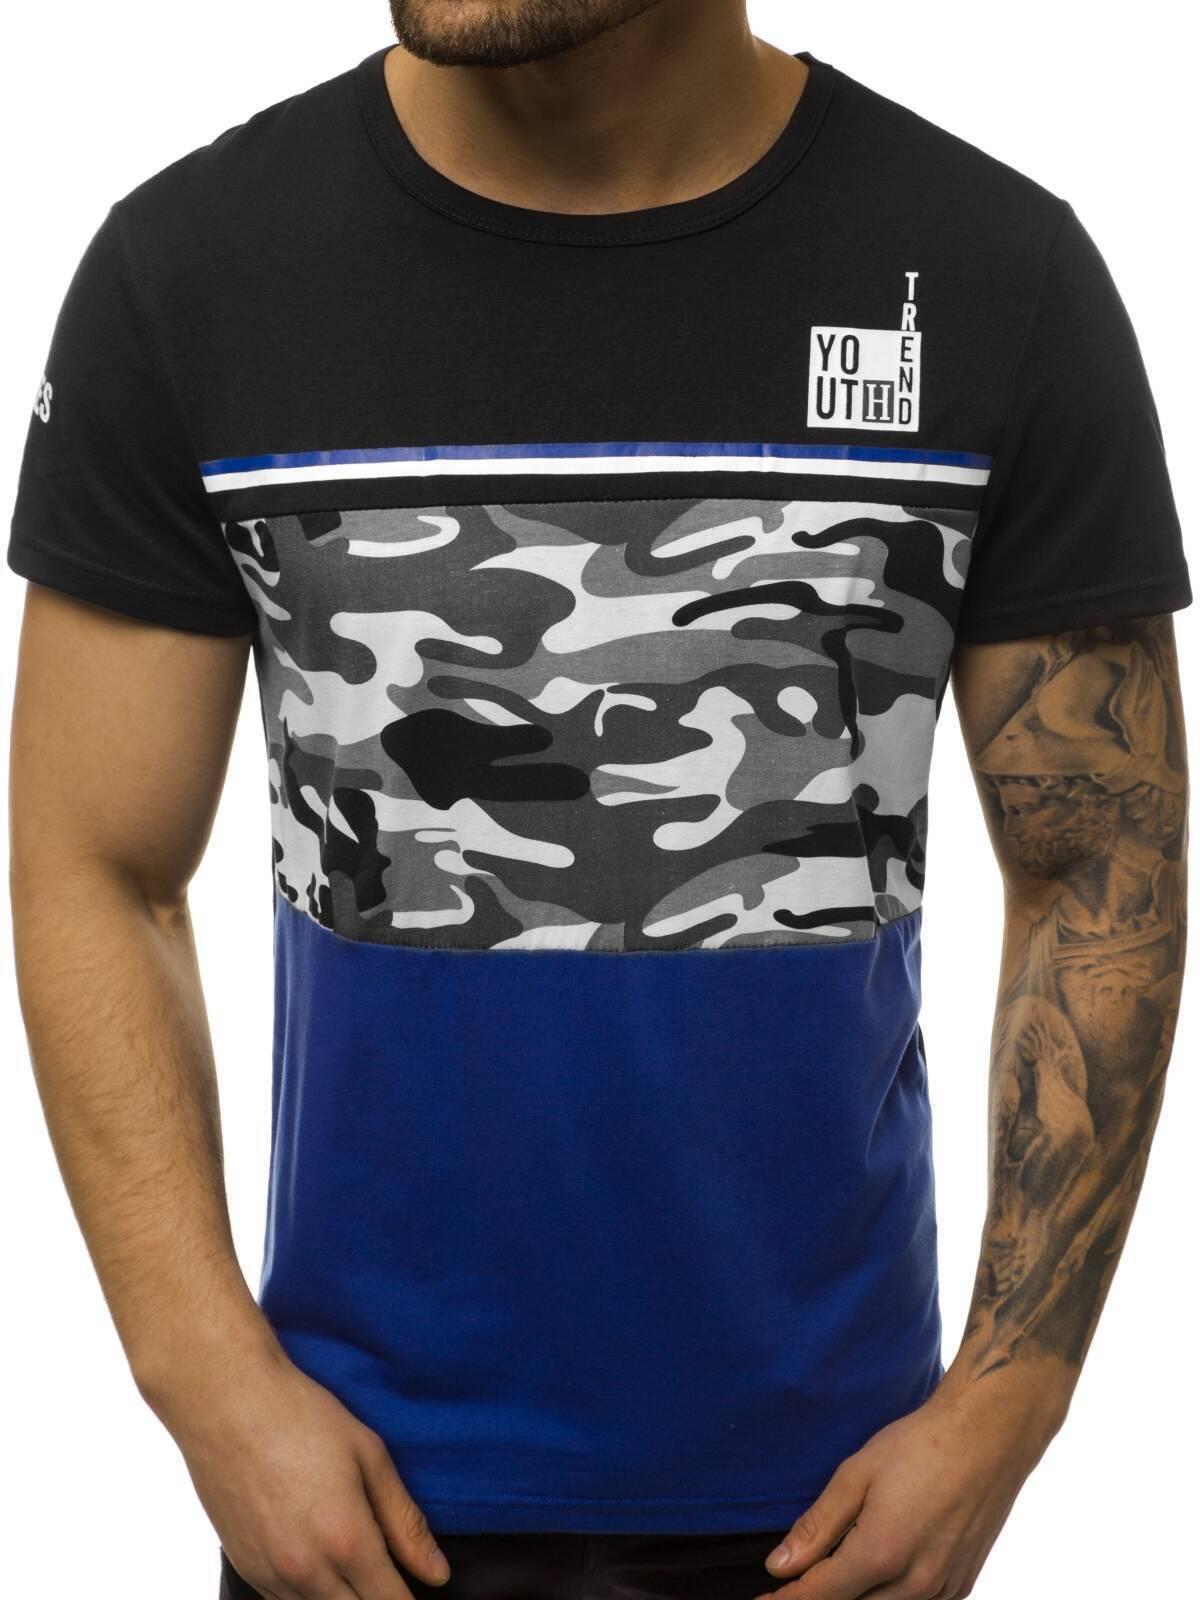 Indexbild 46 - T-Shirt Kurzarm Print Aufdruck Fitness Jogging Sport Shirt Herren OZONEE 12511